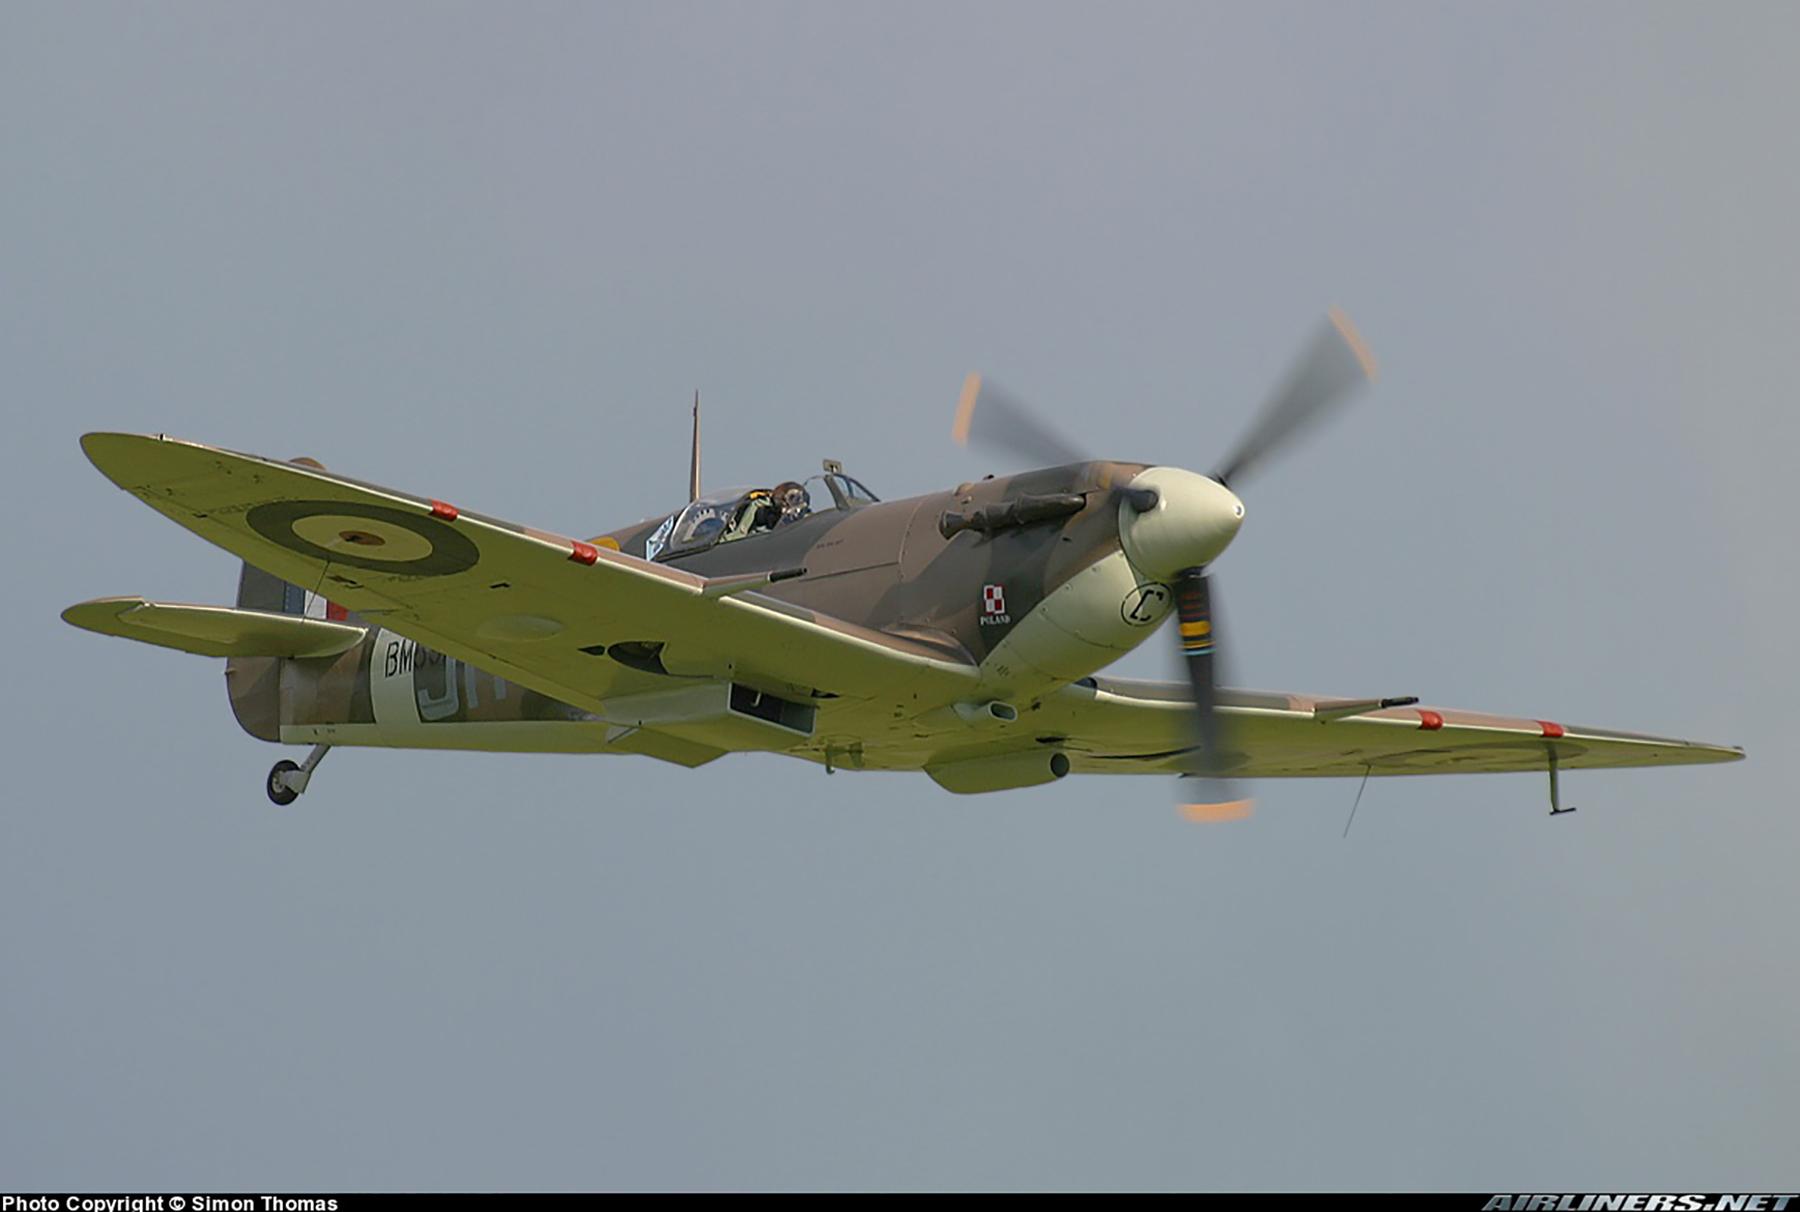 Airworthy Spitfire warbird MkVb RAF 317Sqn JHC BM597 G MKVB 18